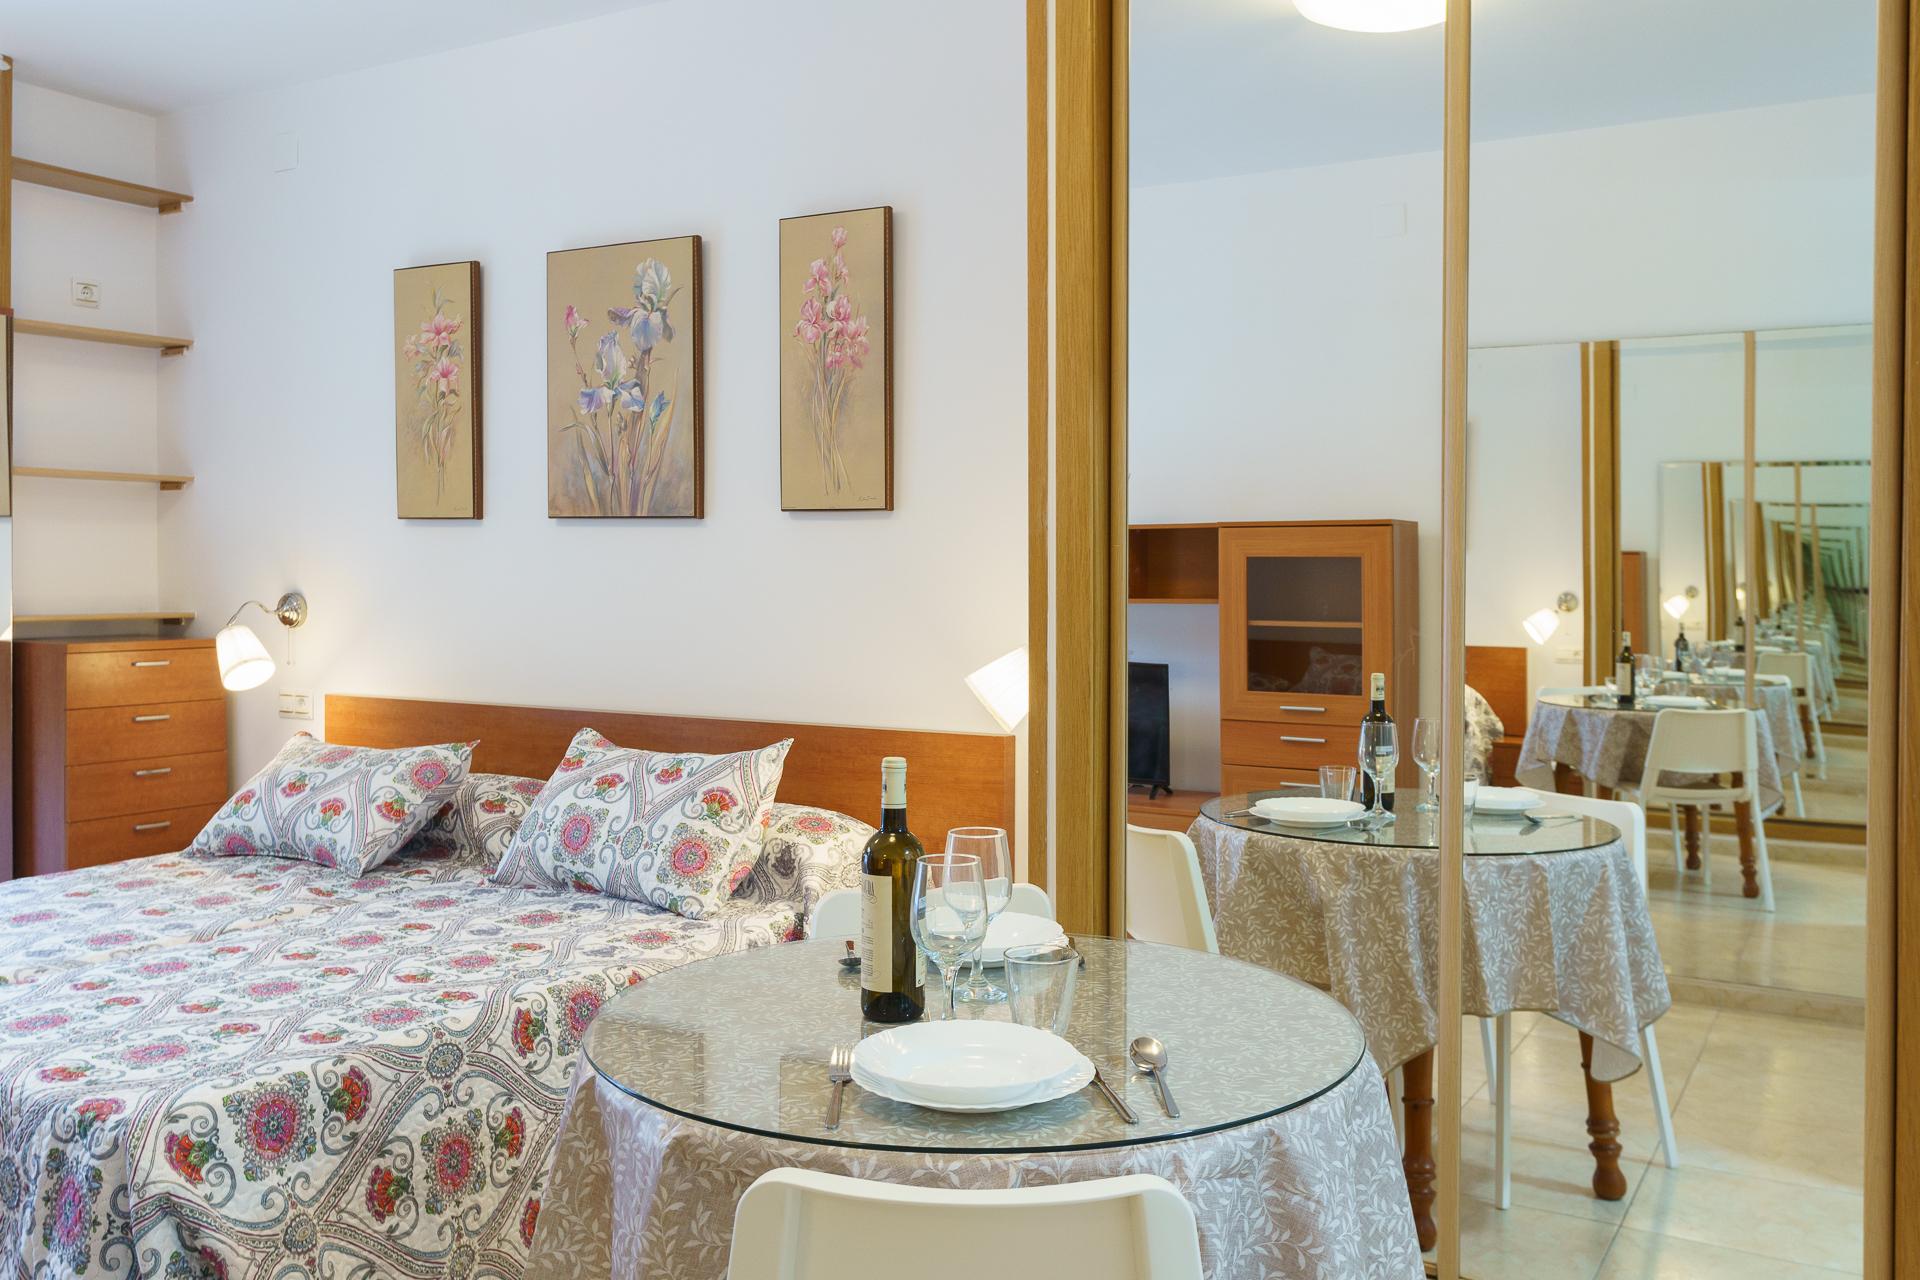 Apartment MalagaSuite Studio on the Beach photo 21409889